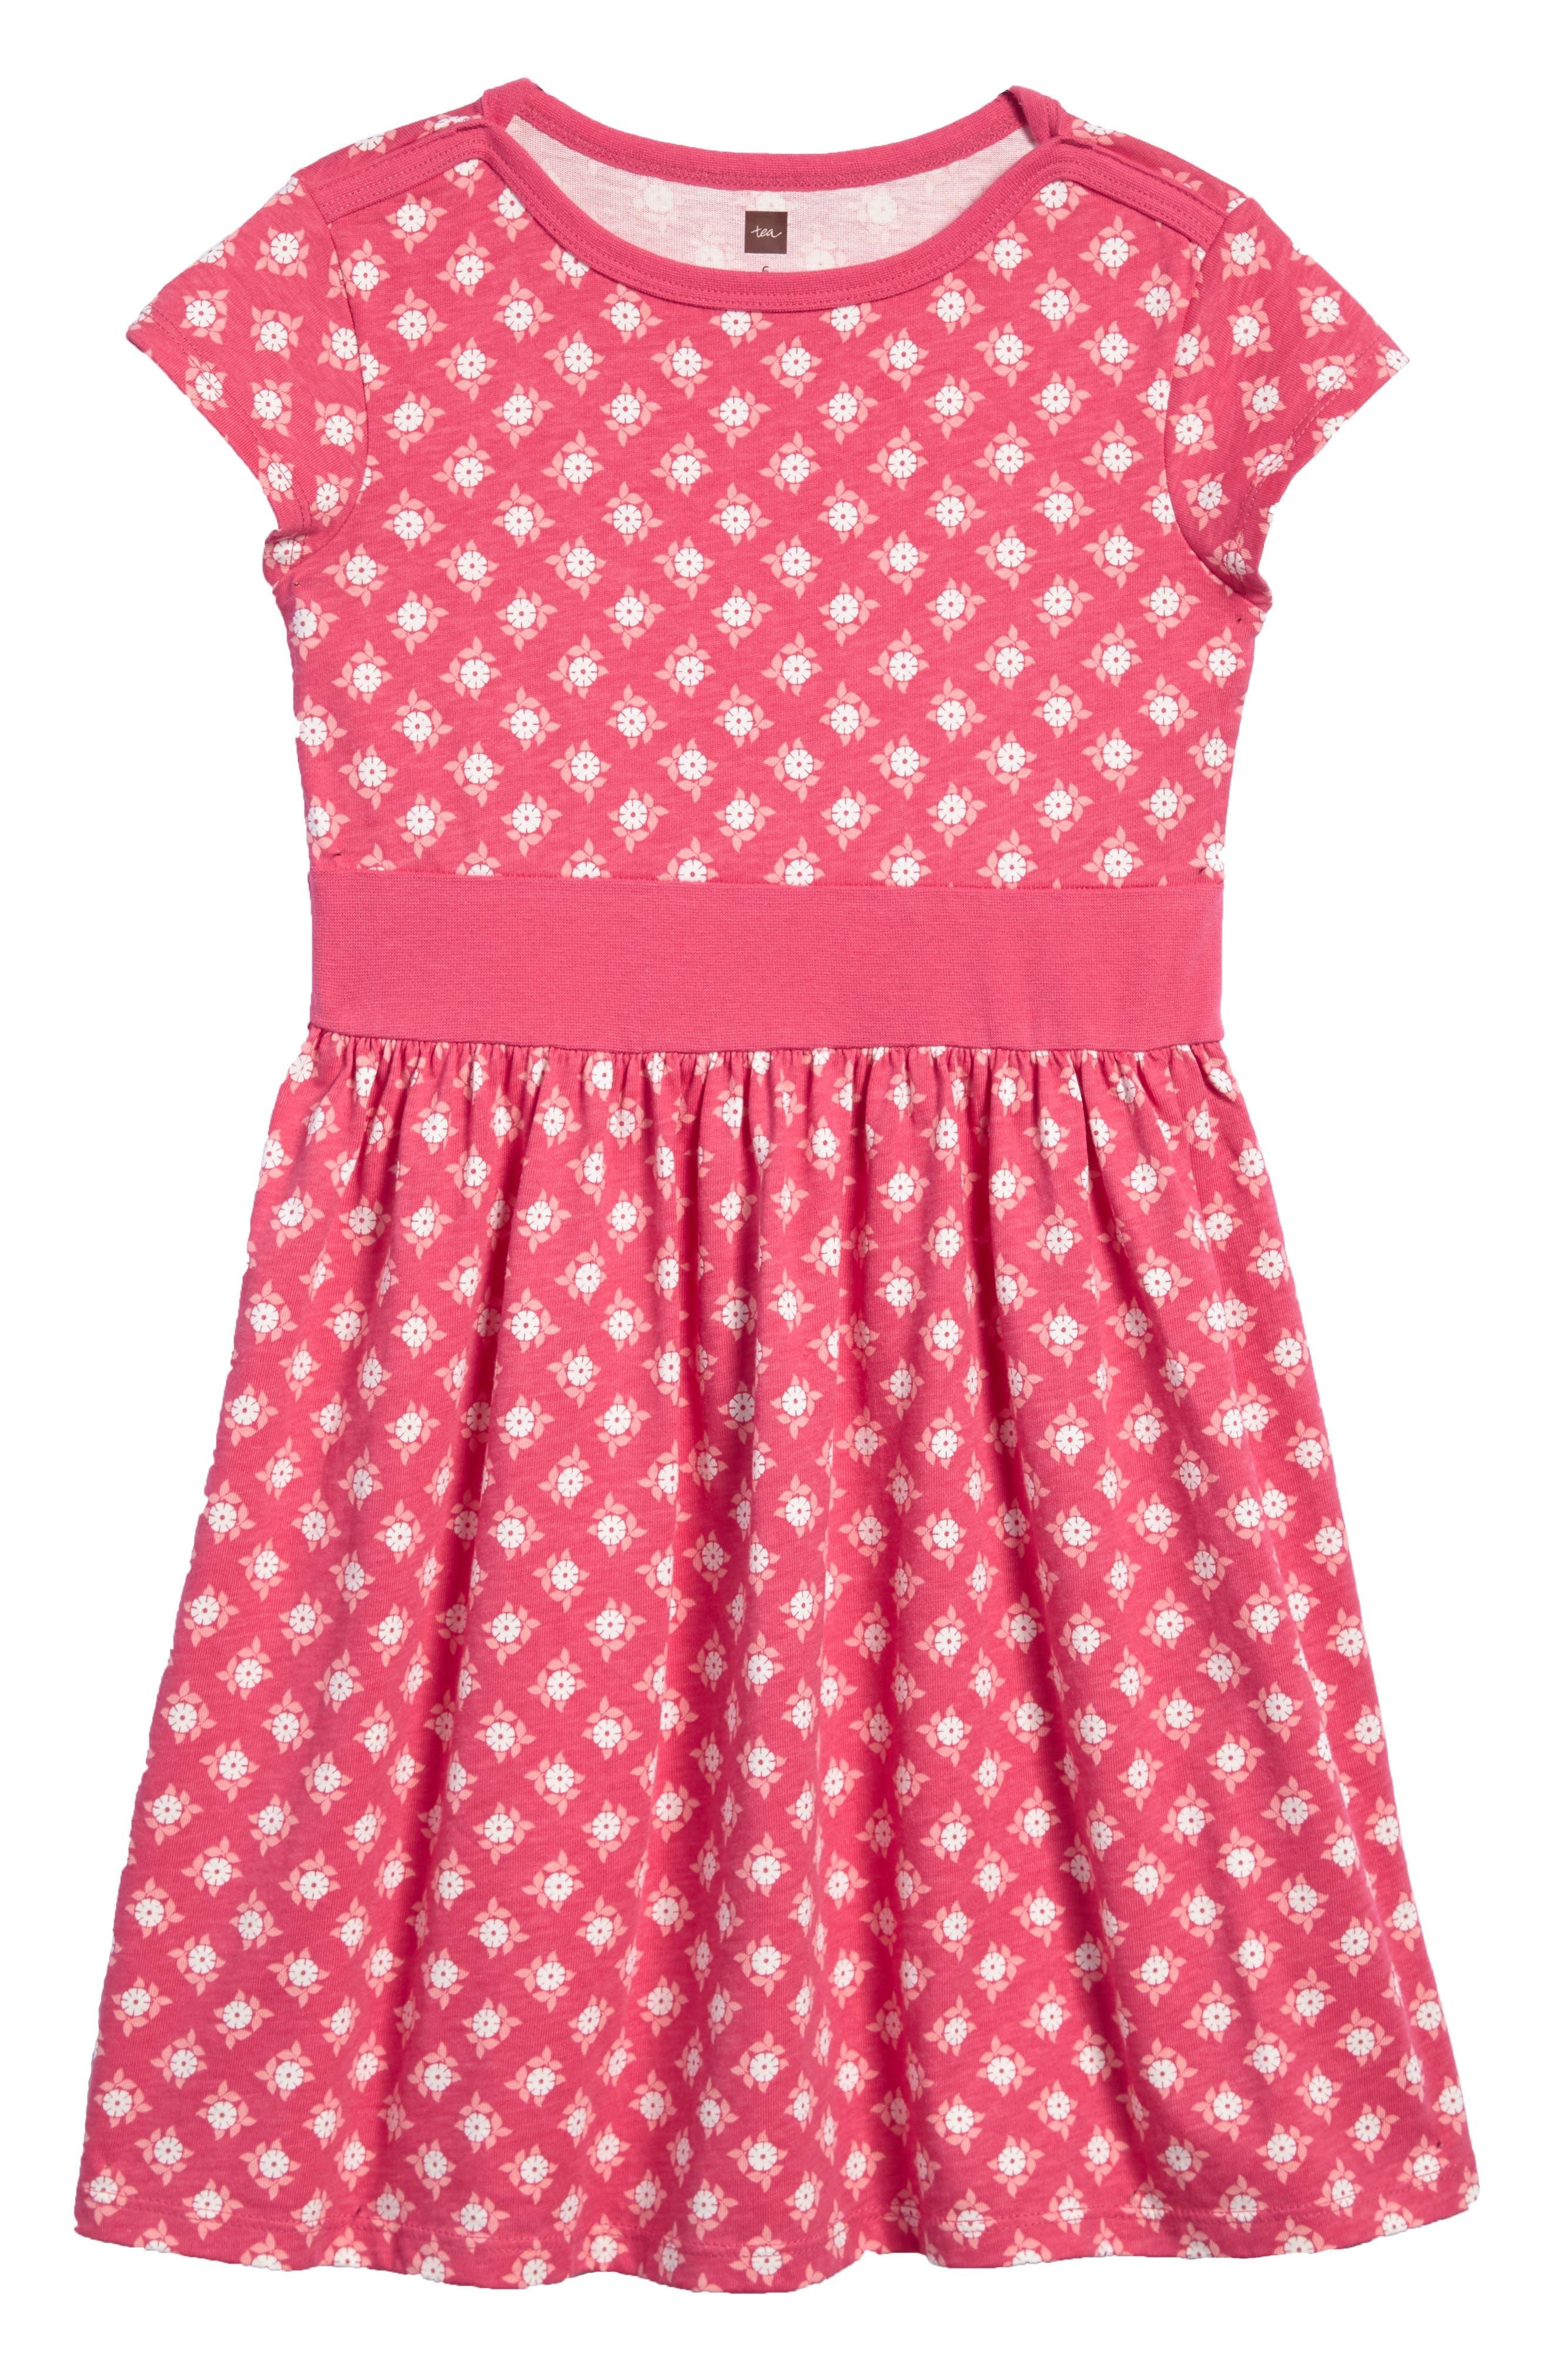 Alternate Image 1 Selected - Tea Collection Sunburst Dress (Baby Girls)